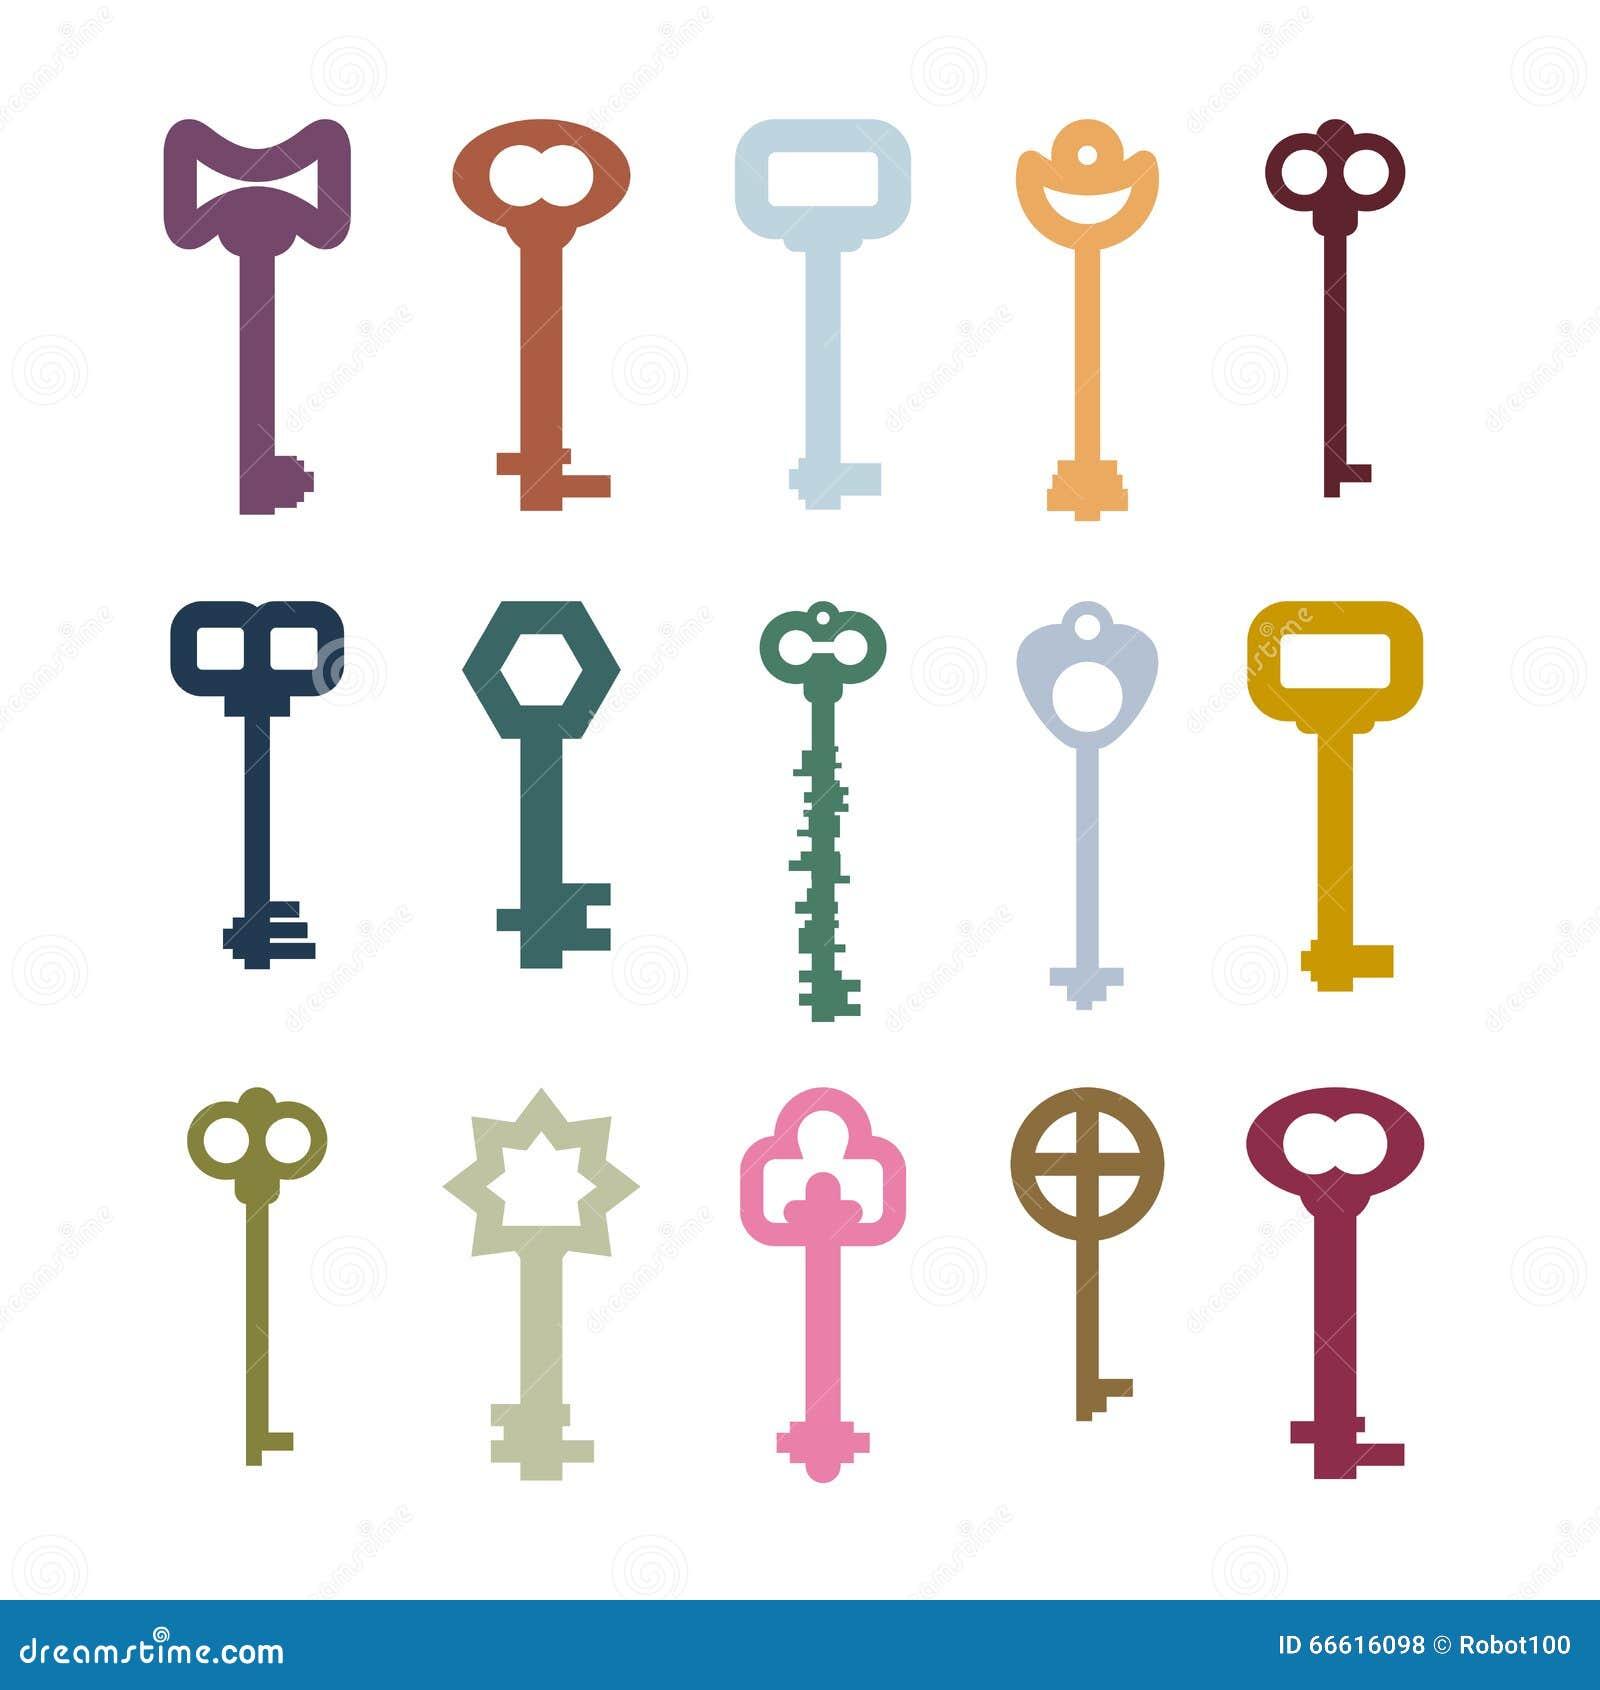 old vintage keys set. Color clues from ancient castles. Door vintage key collection